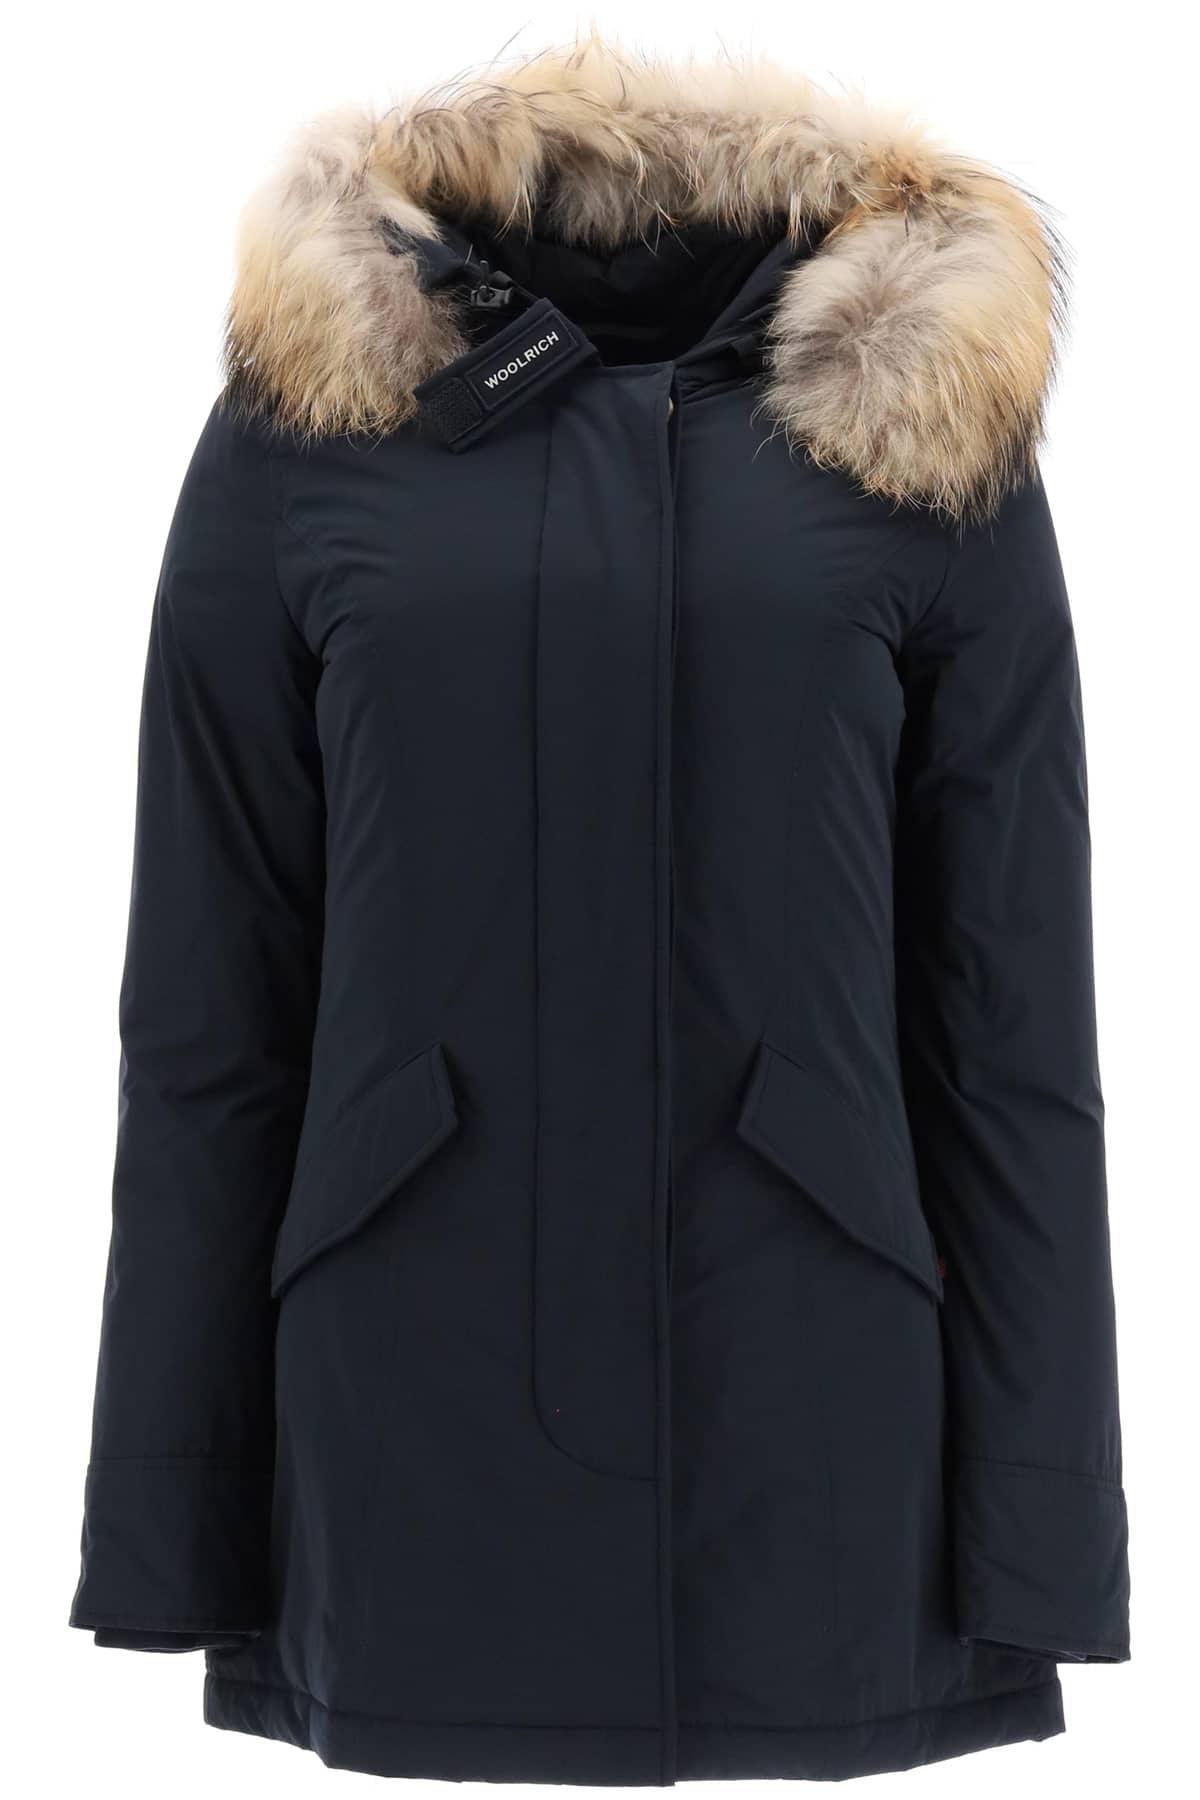 WOOLRICH LUXURY ARCTIC PARKA WITH MURMASKY FUR M Blue Technical, Fur